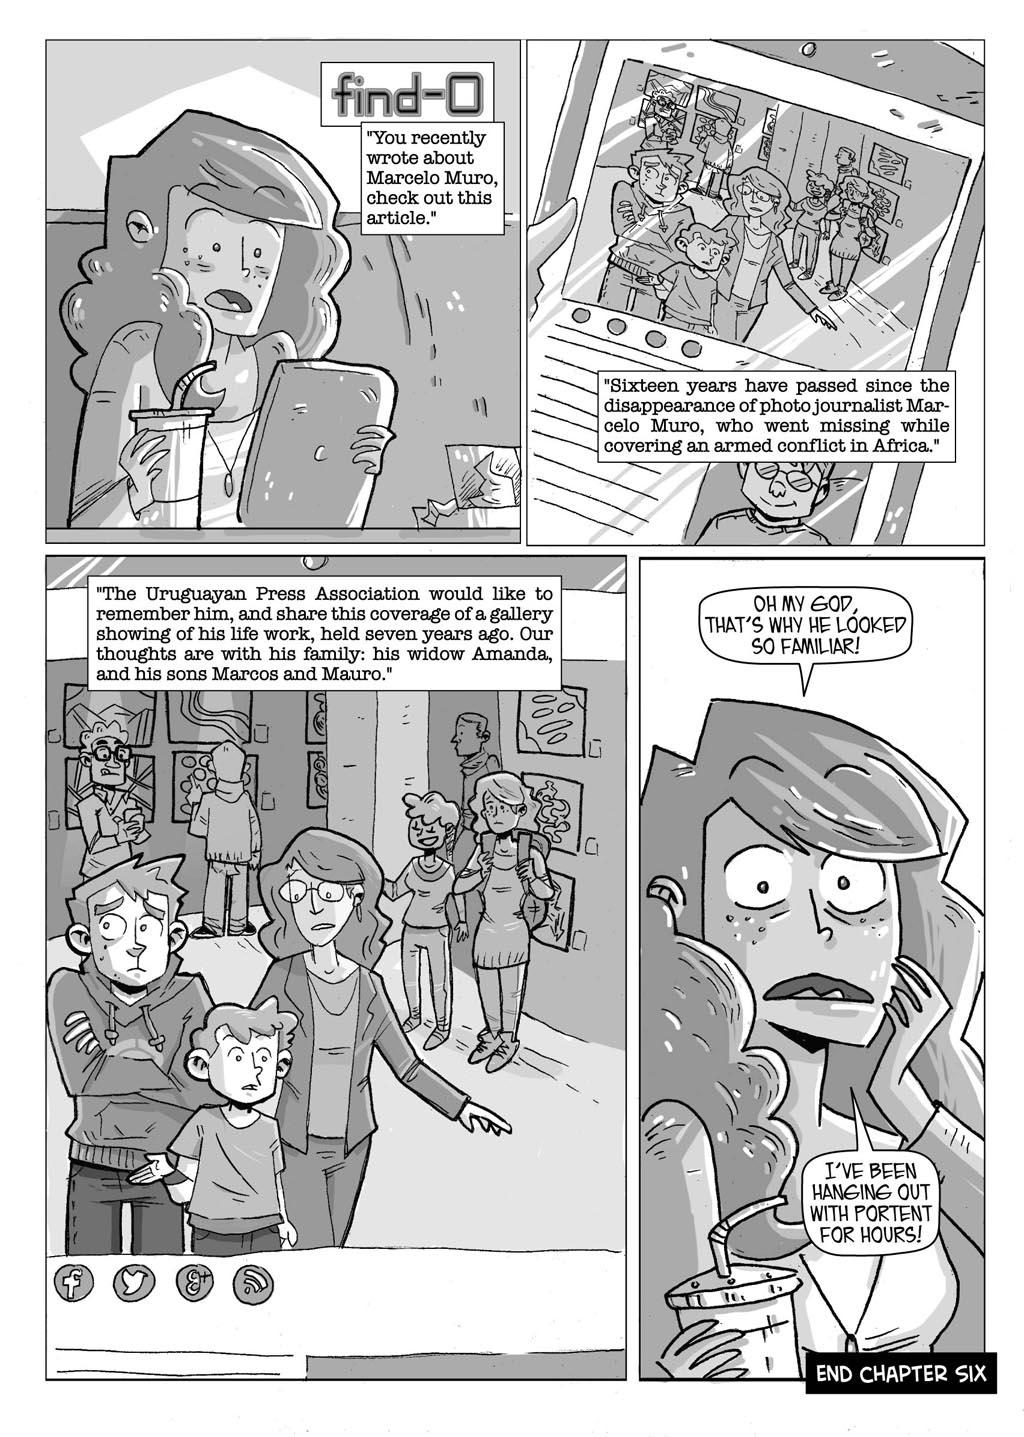 Portent - Page 34